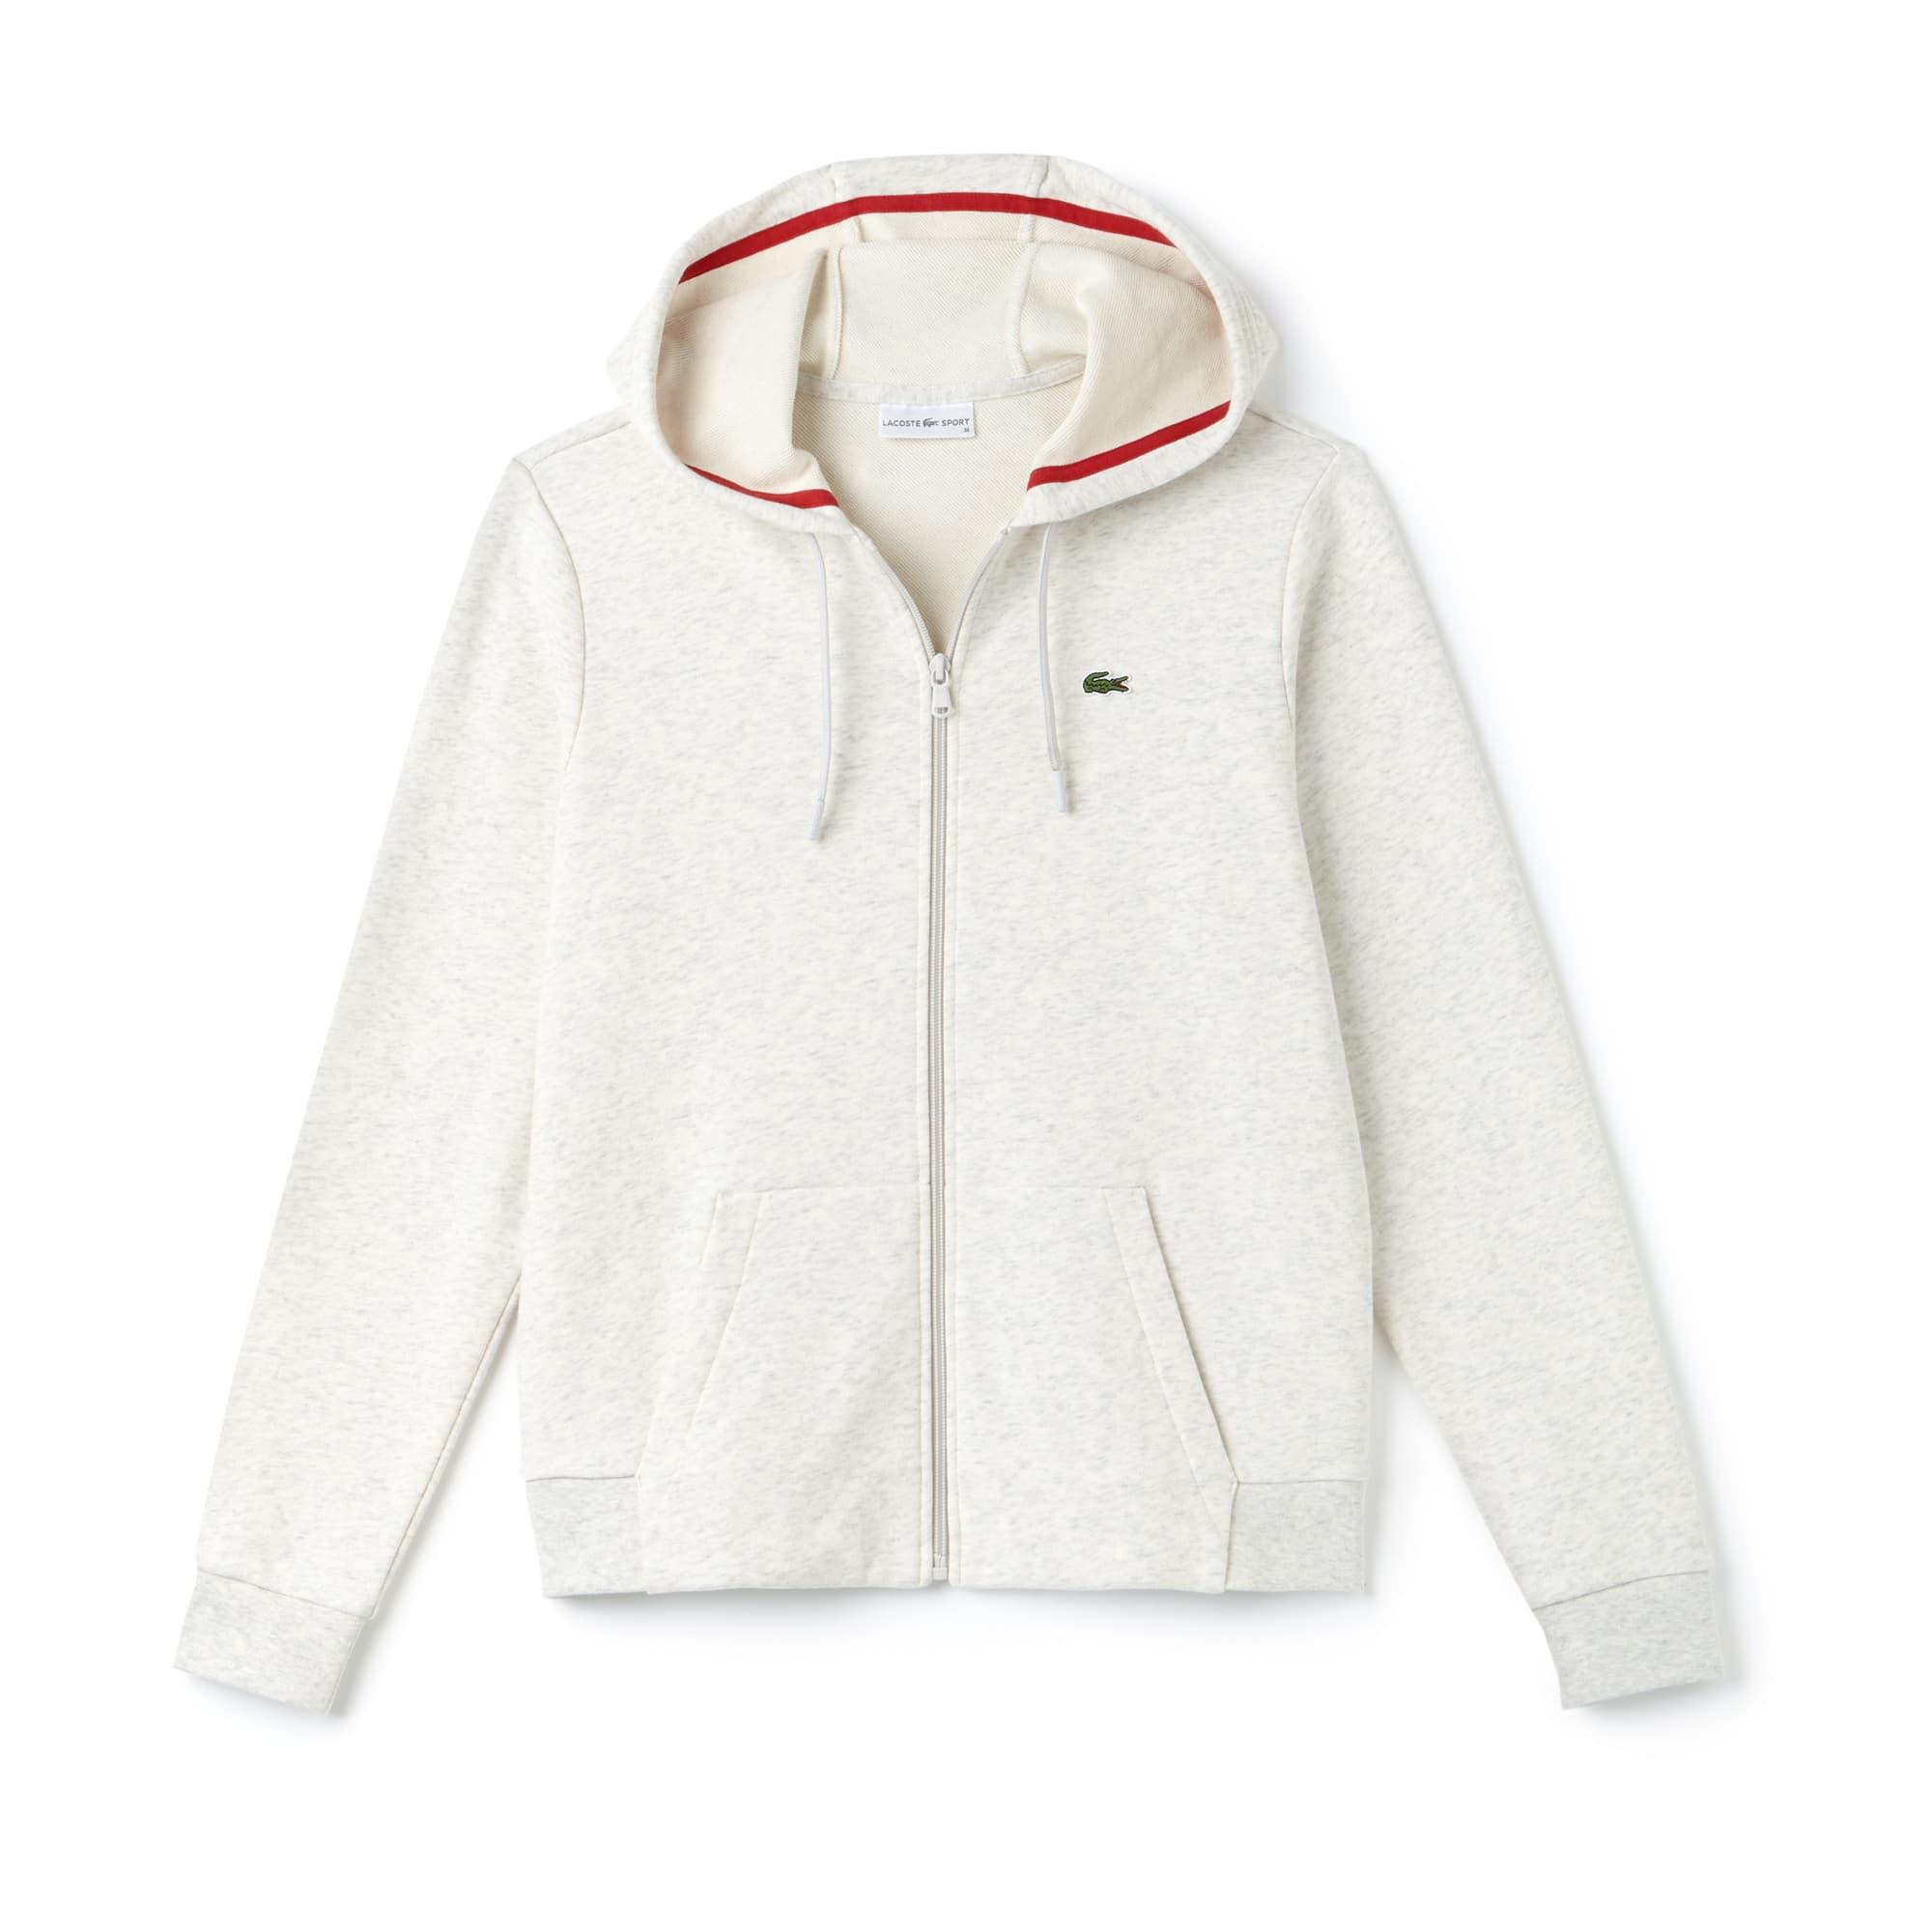 Lacoste SPORT女士网球连帽拉链抓绒运动衫